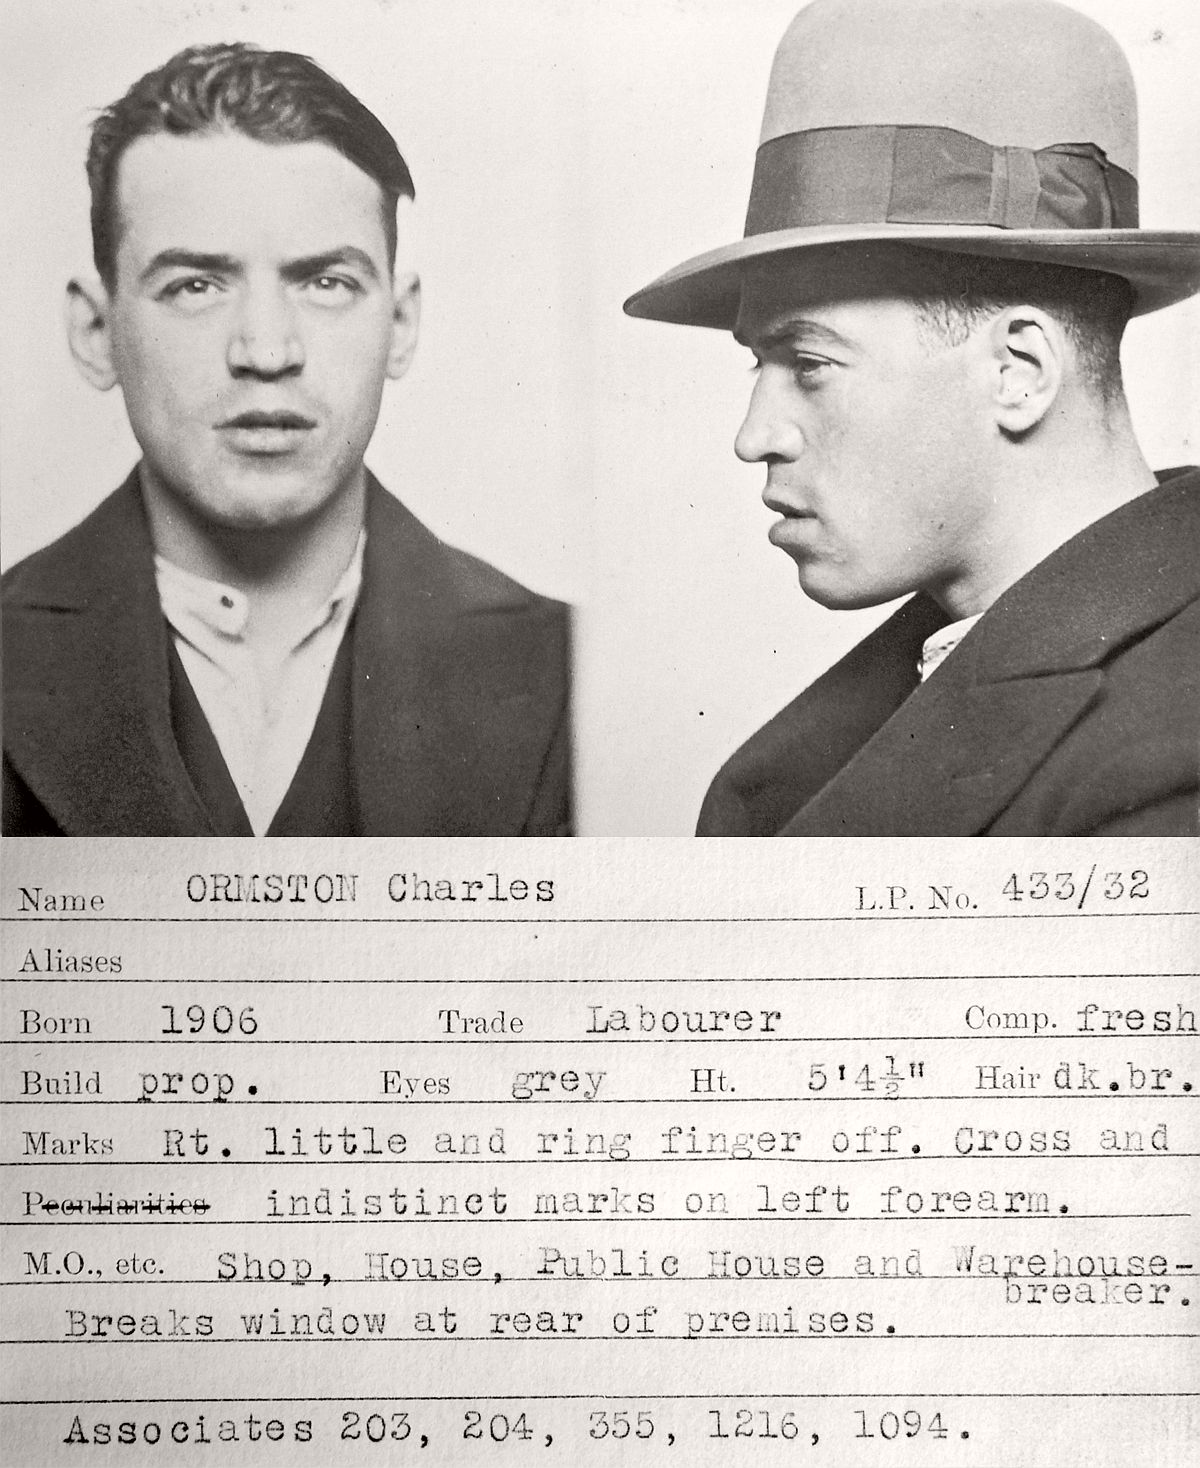 vintage-mug-shot-of-criminals-from-newcastle-upon-tyne-1930s-01